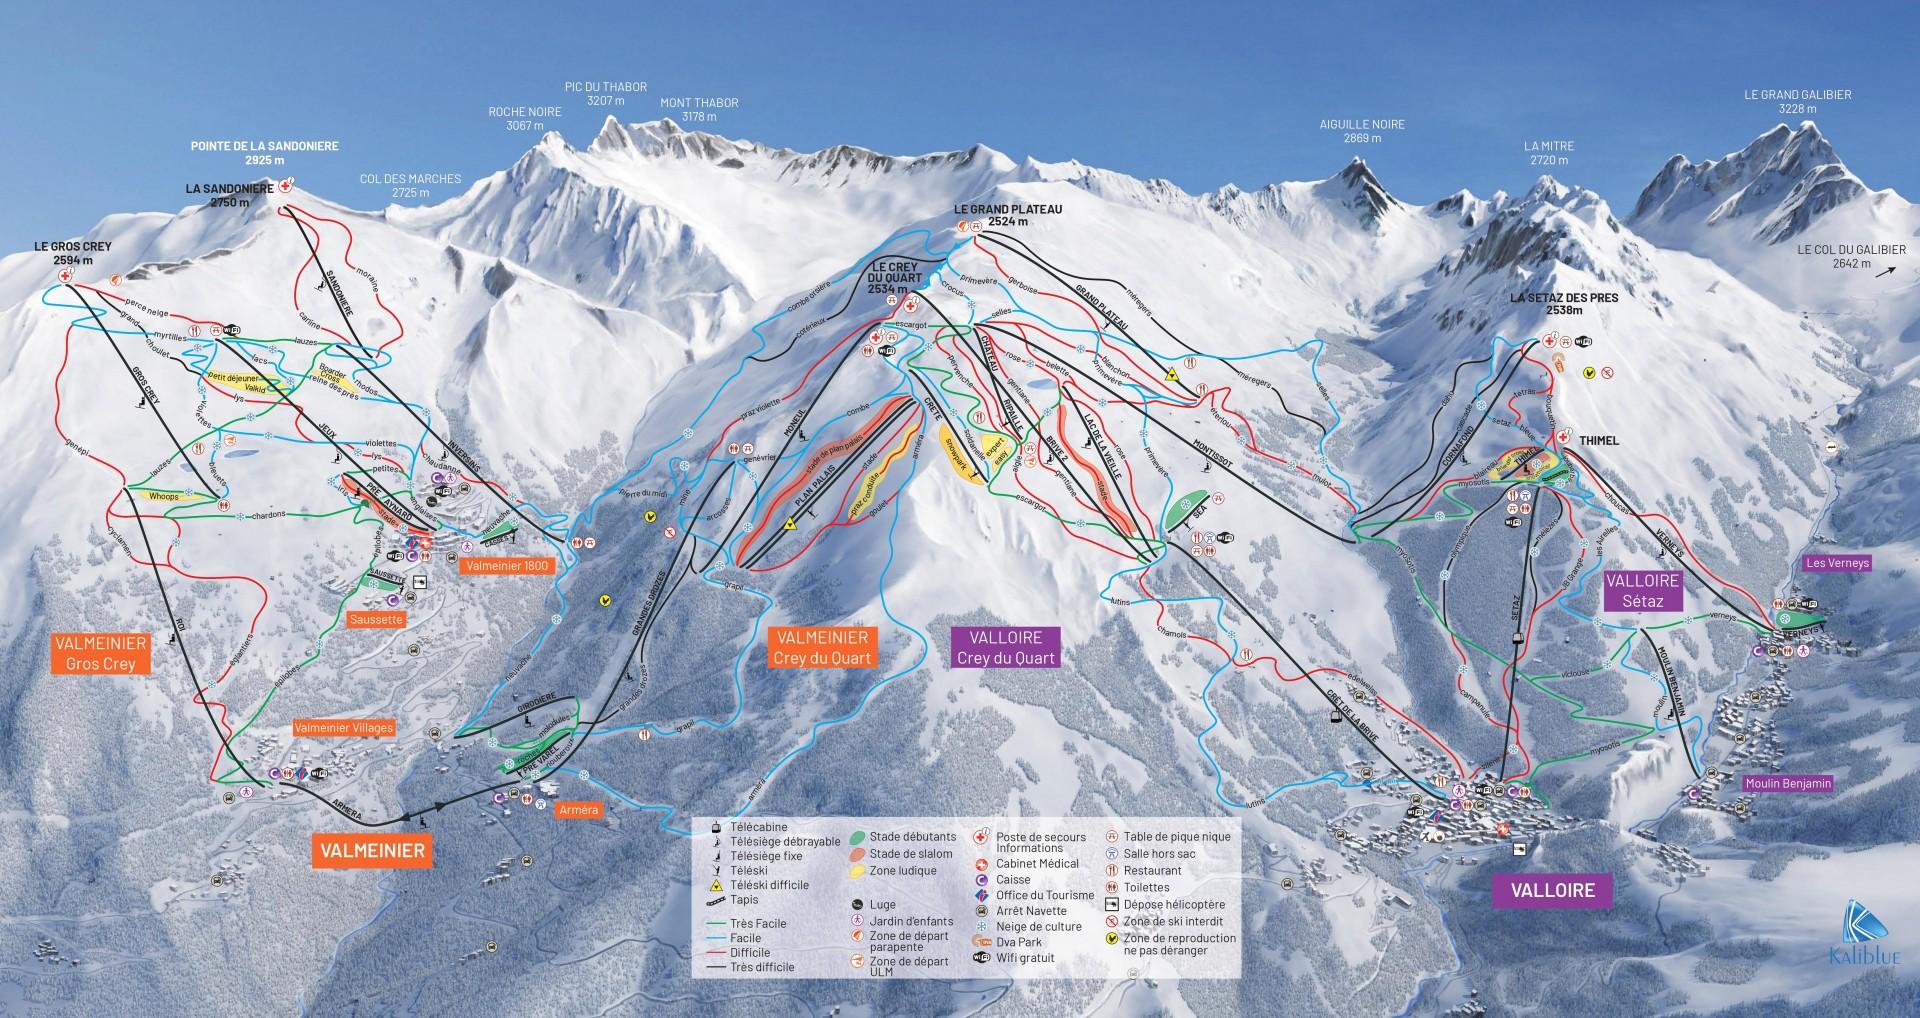 valmeinier-valloire-hiver-2020-2021-400.